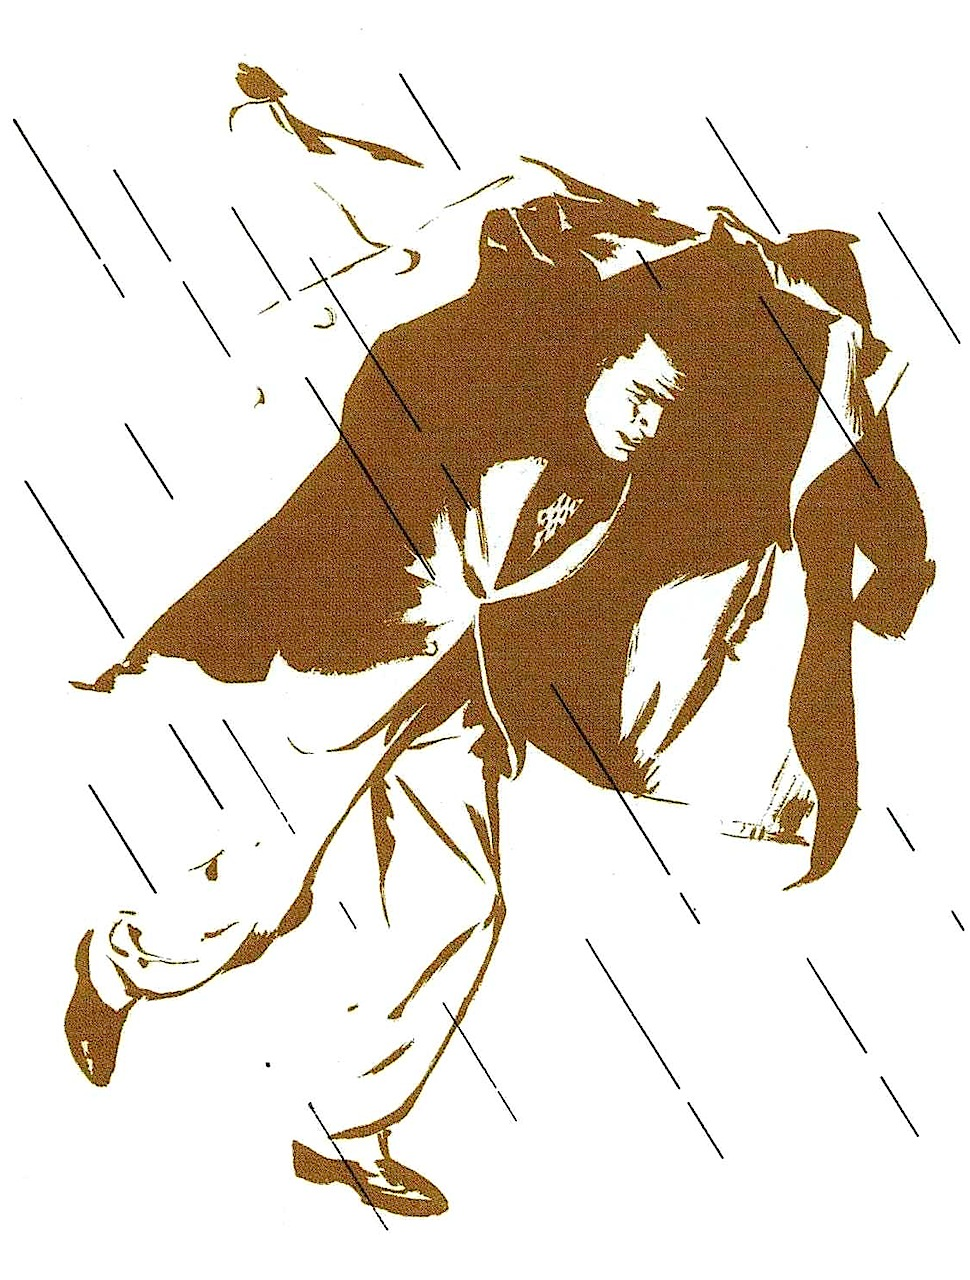 Al Parker illustration, caught in the rain